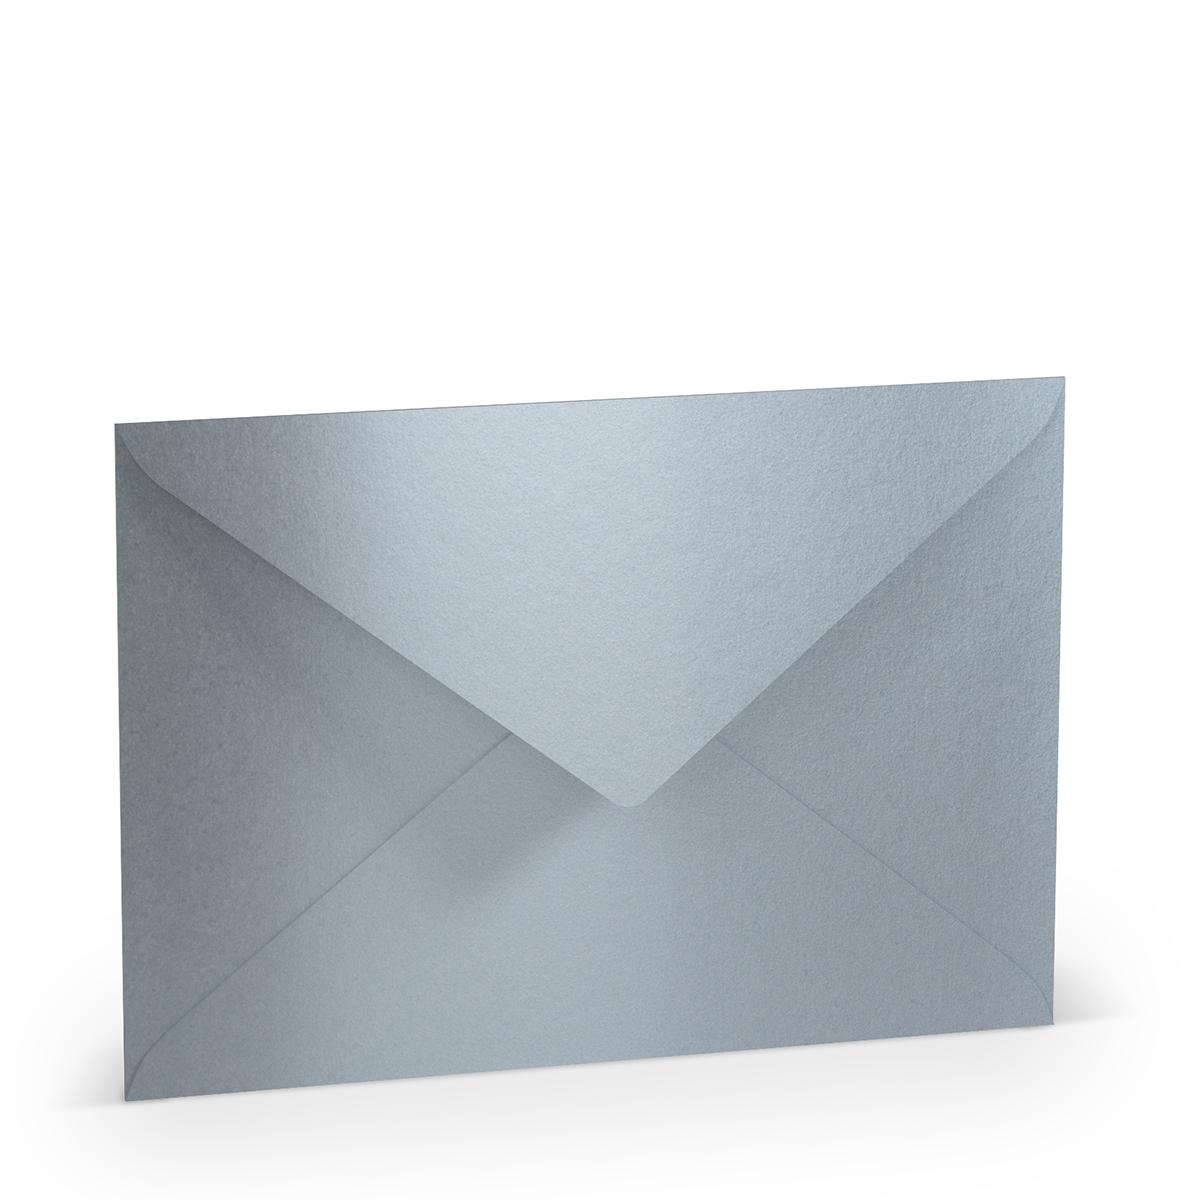 Din A4 Blatt Brief Falten Wwwpapedelcacom